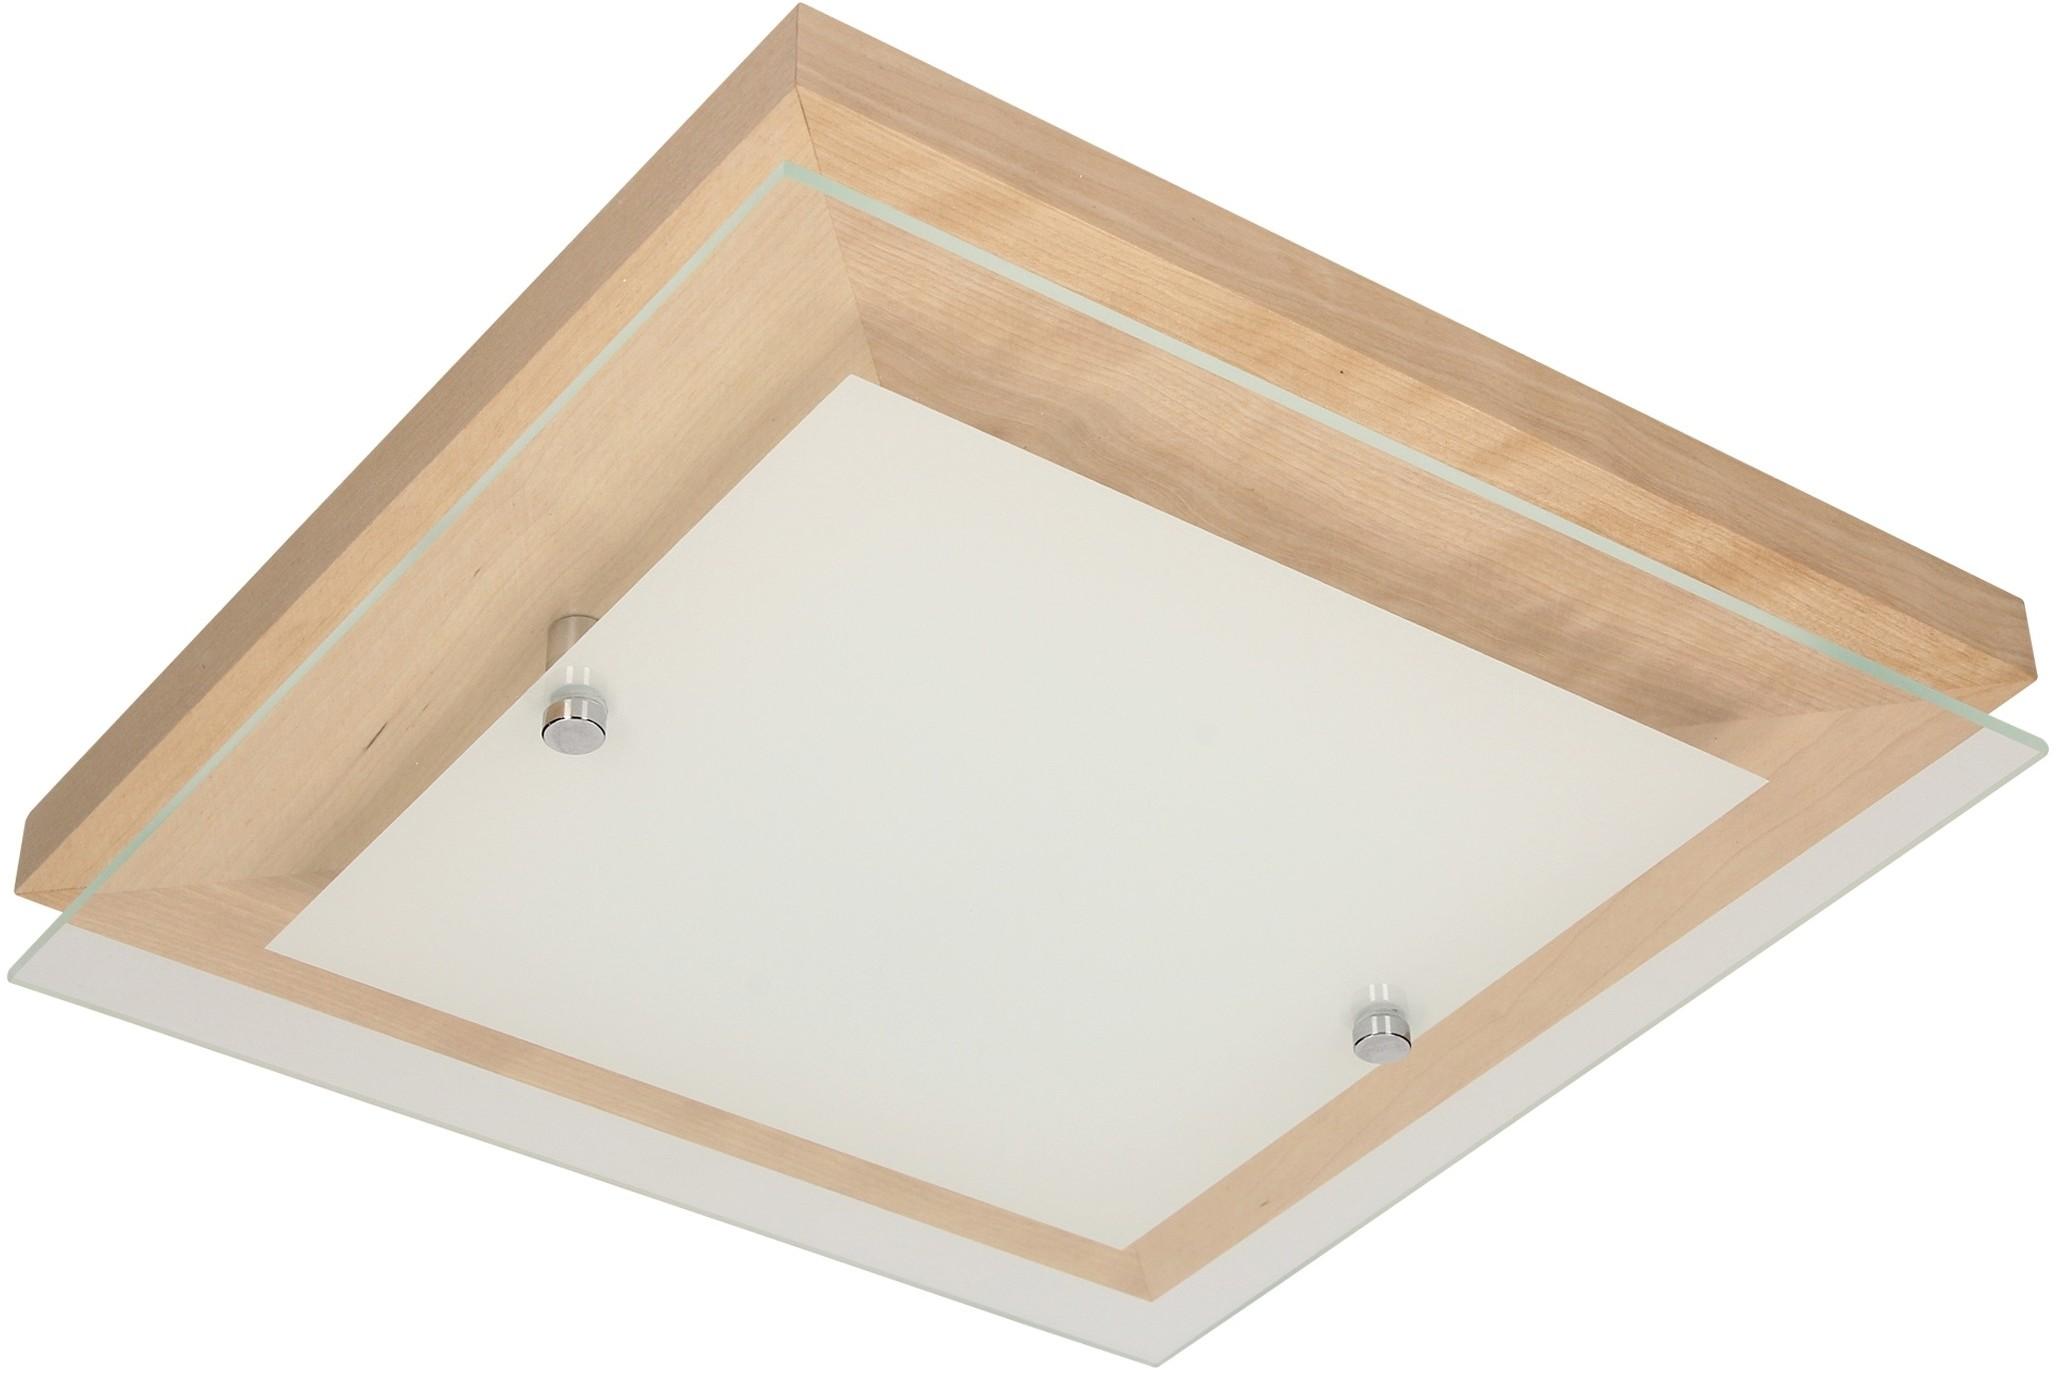 Spotlight FINN plafon LED 14W z funkcją ściemniania dąb 4122970